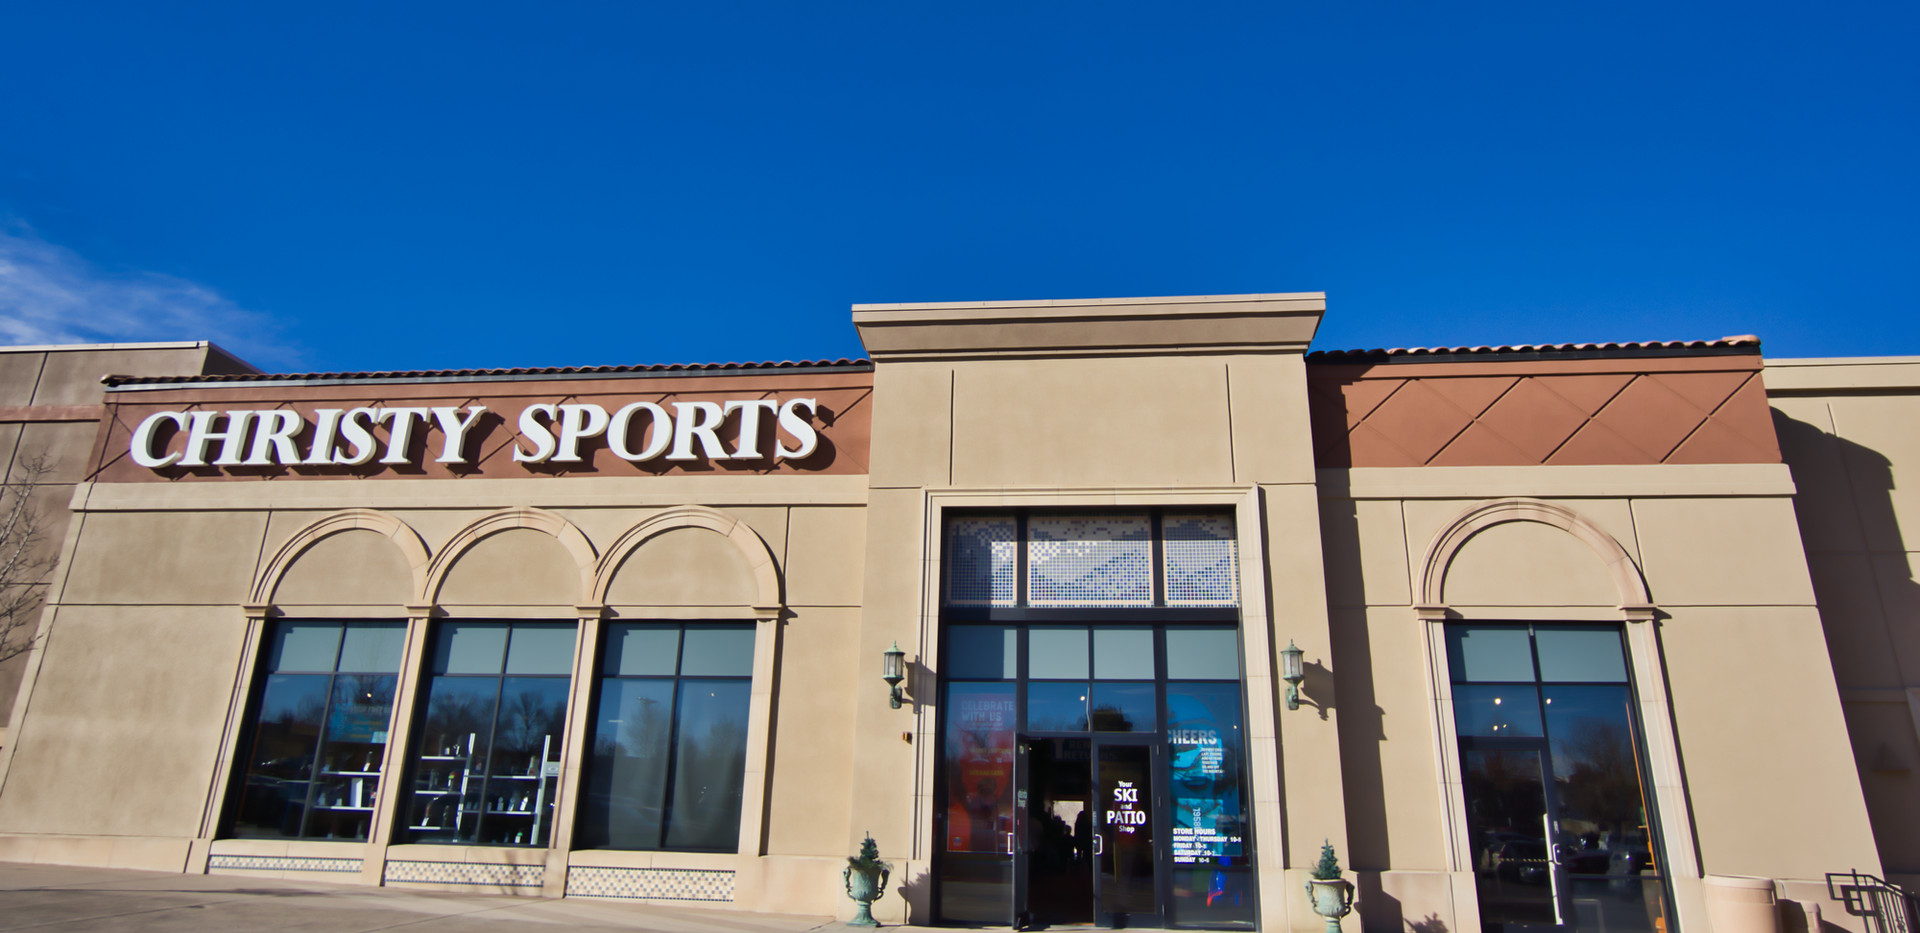 Chisty Sports